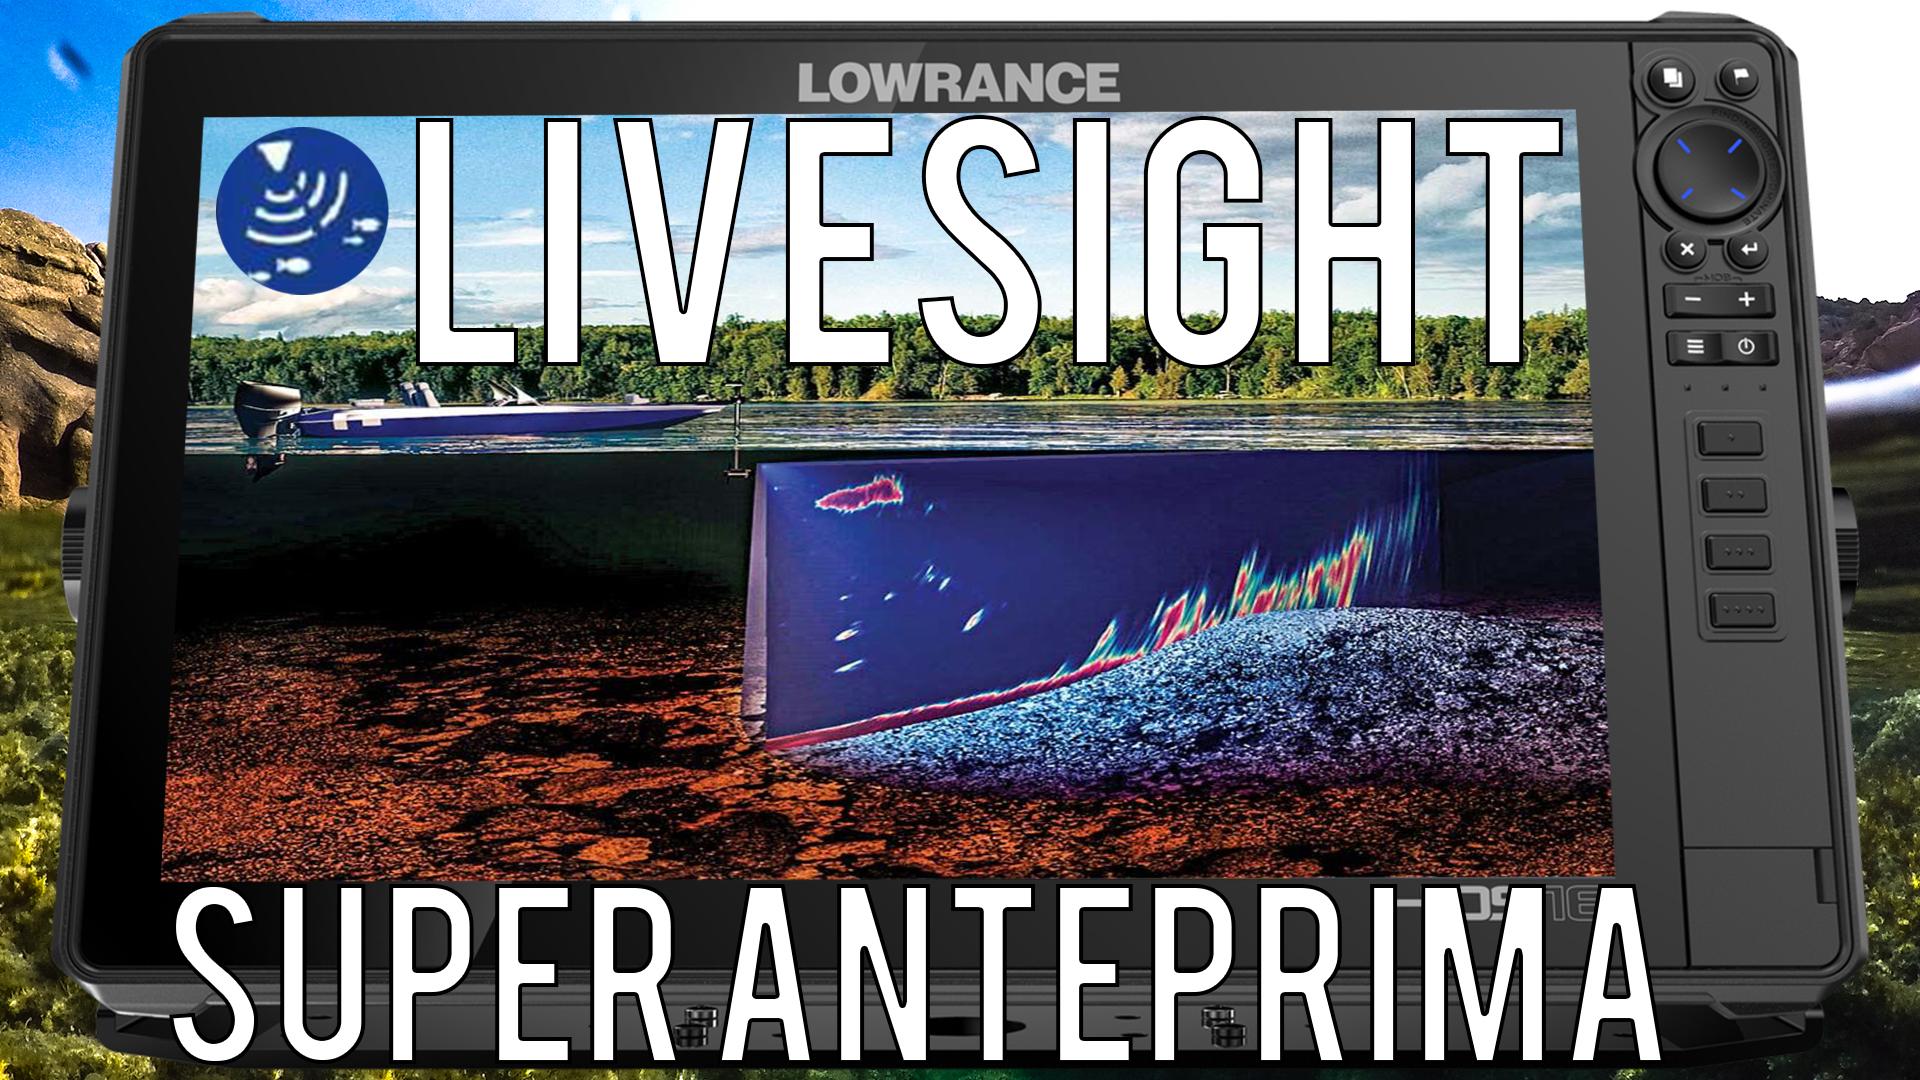 livesight lowrance anteprima